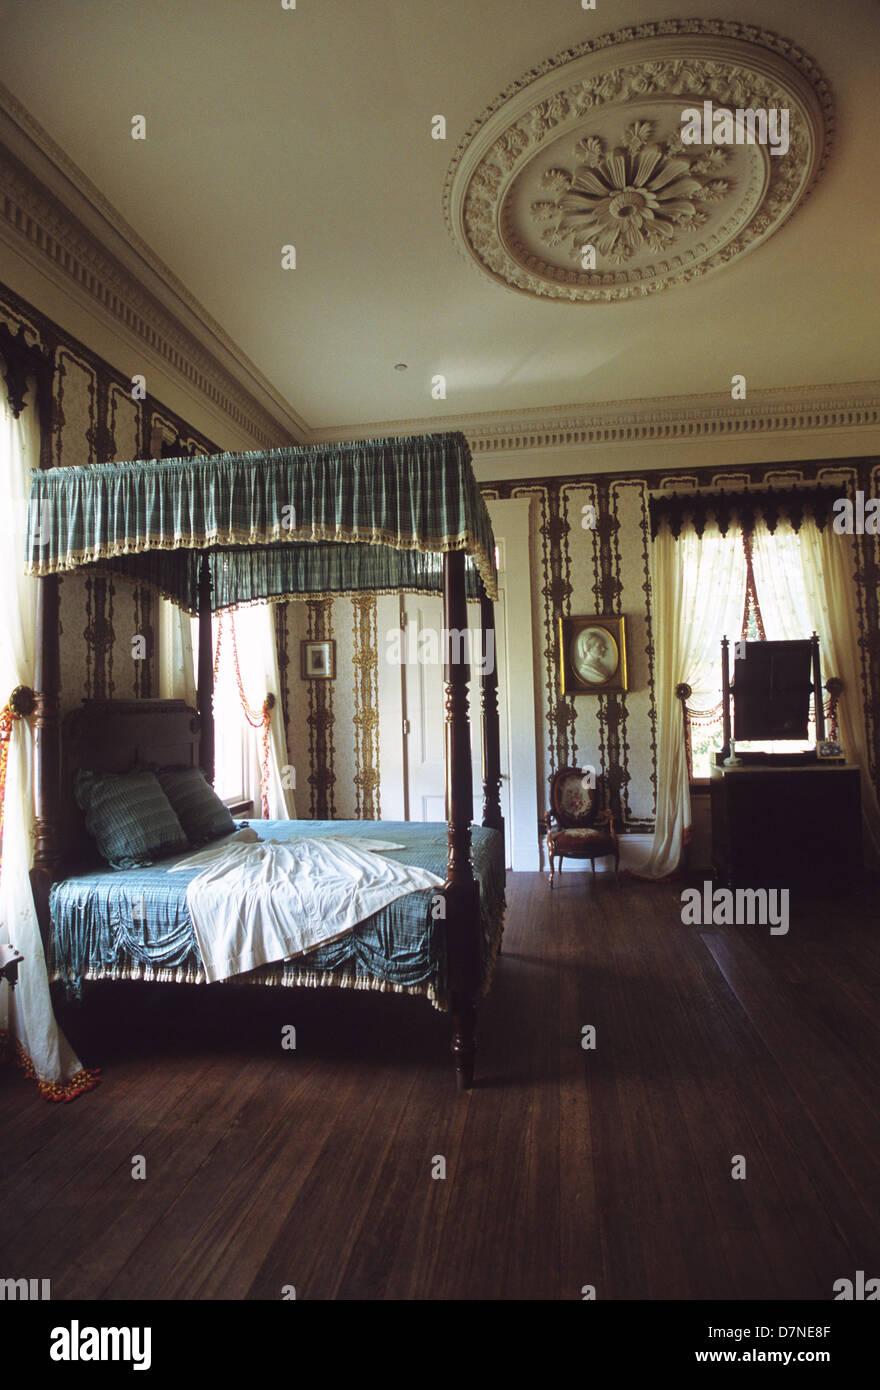 Elk283-3008v Louisiana, St Francisville, Rosedown Plantation State Historic Site, Mansion, 1836, bedroom - Stock Image